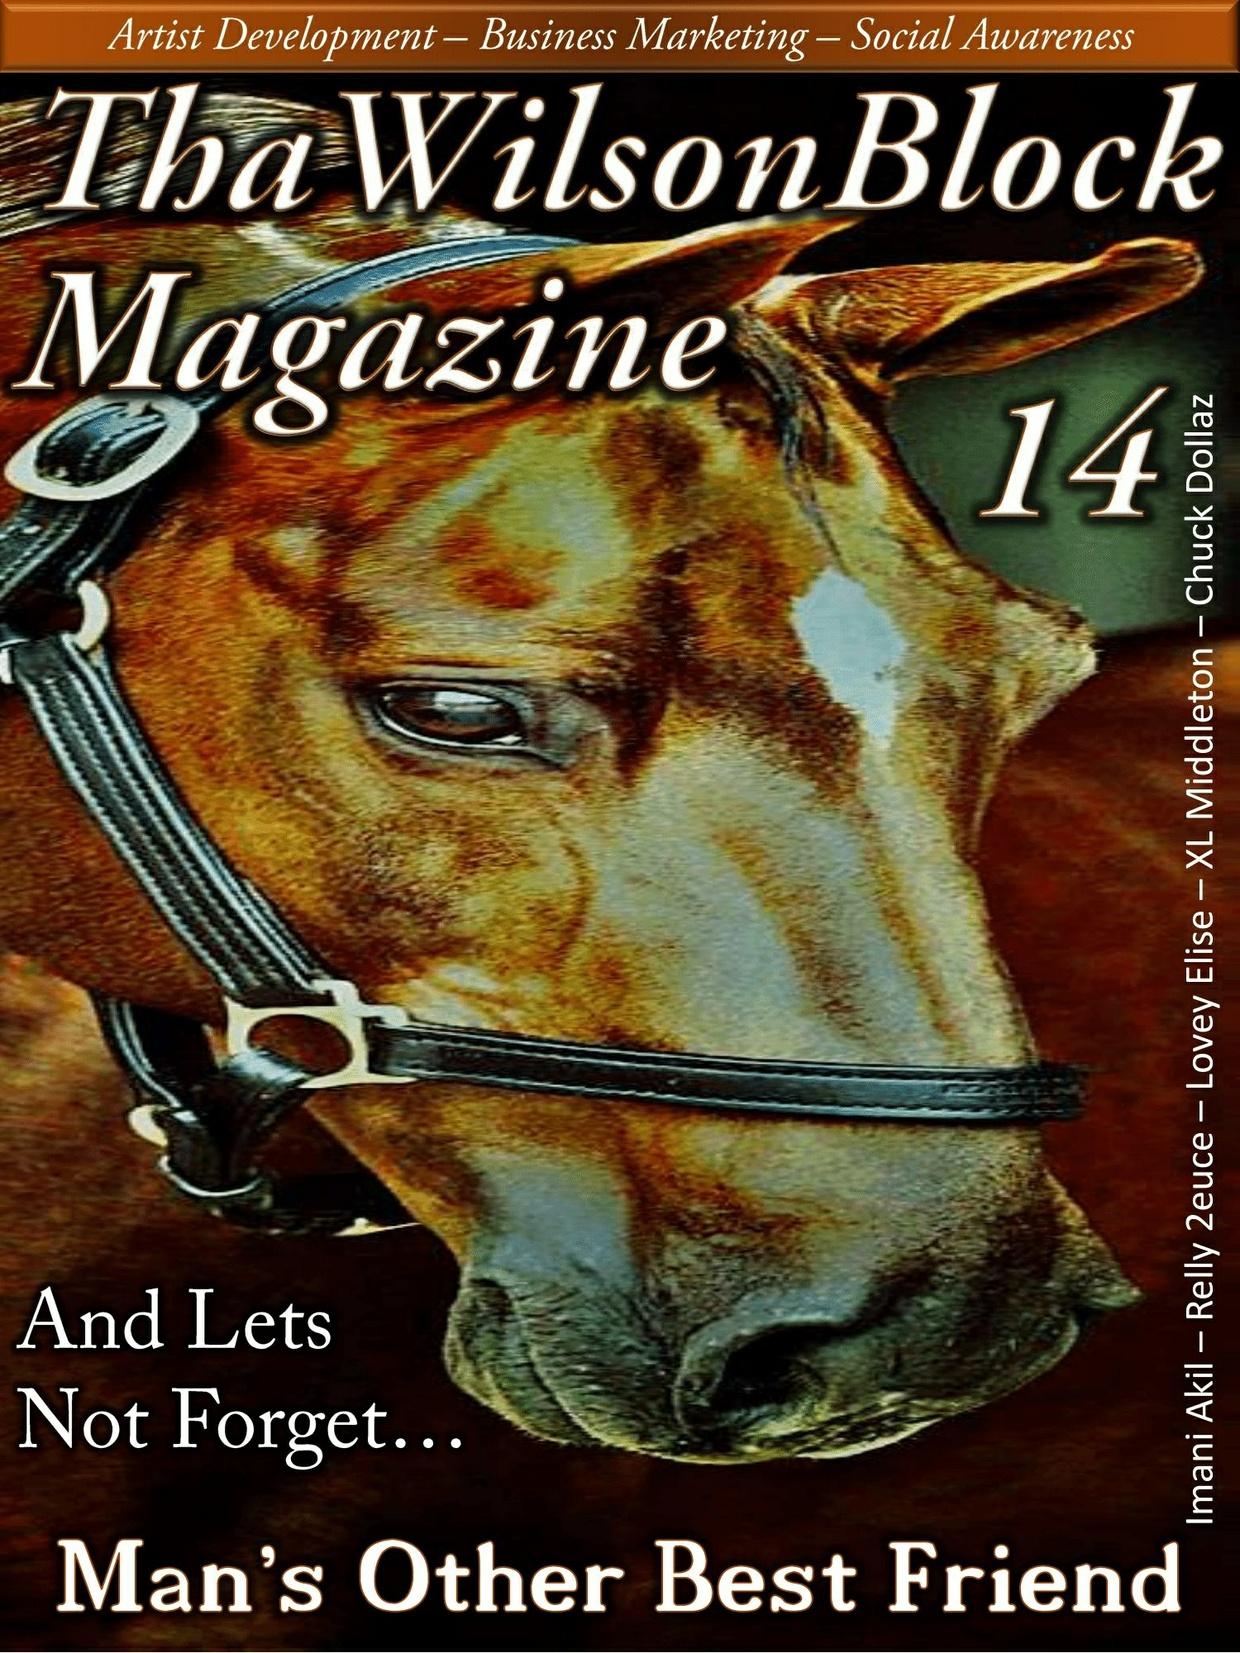 ThaWilsonBlock Magazine Issue14